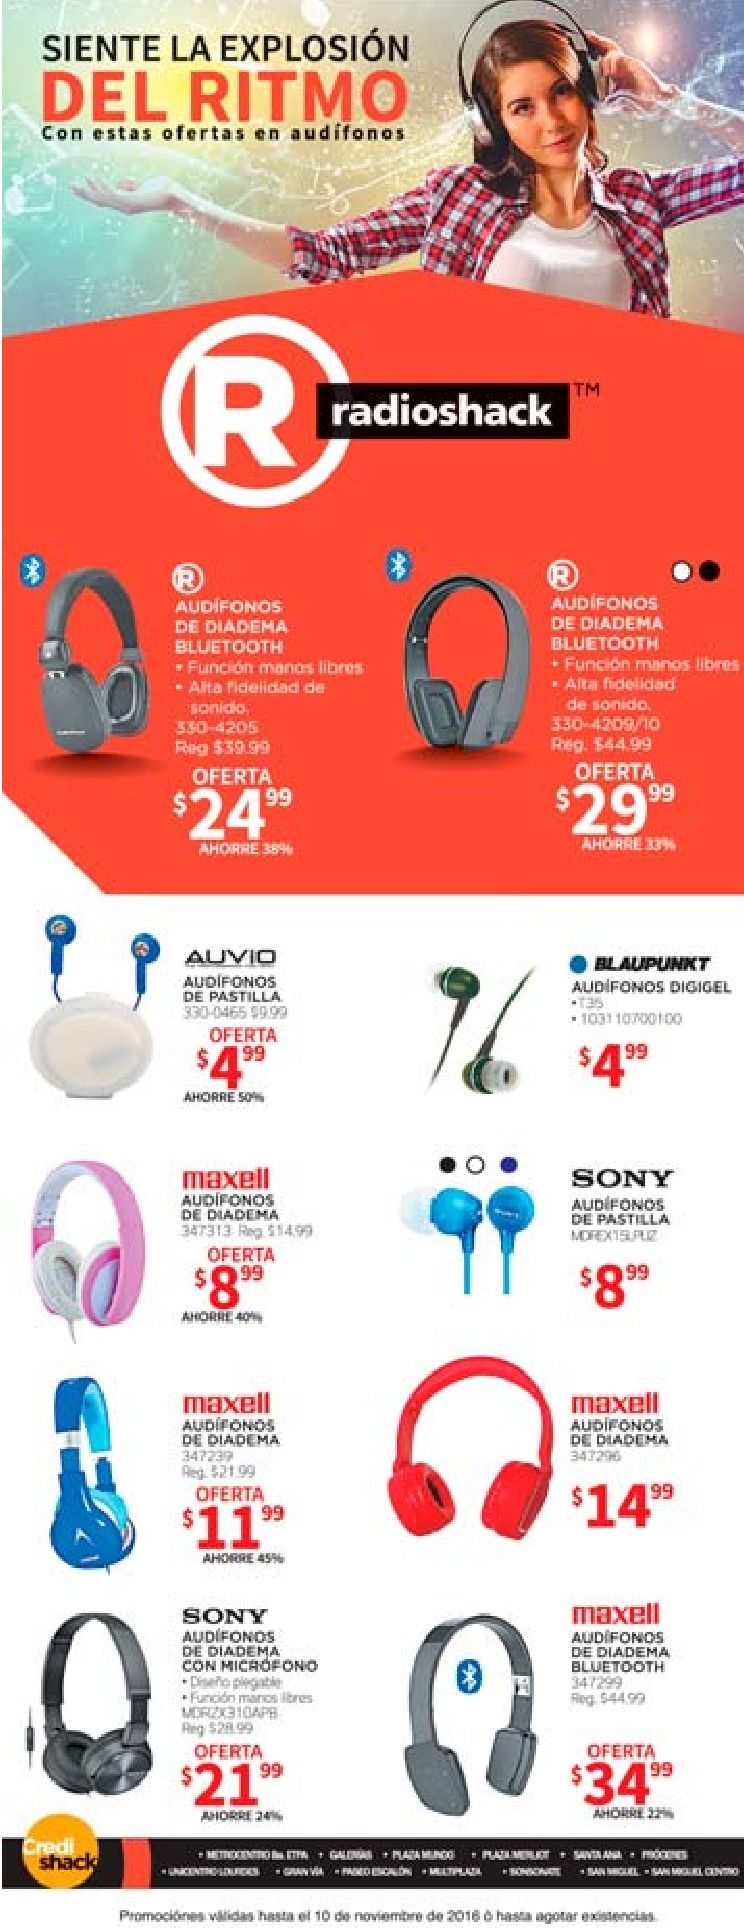 music-headphone-promotions-radioshack-sv